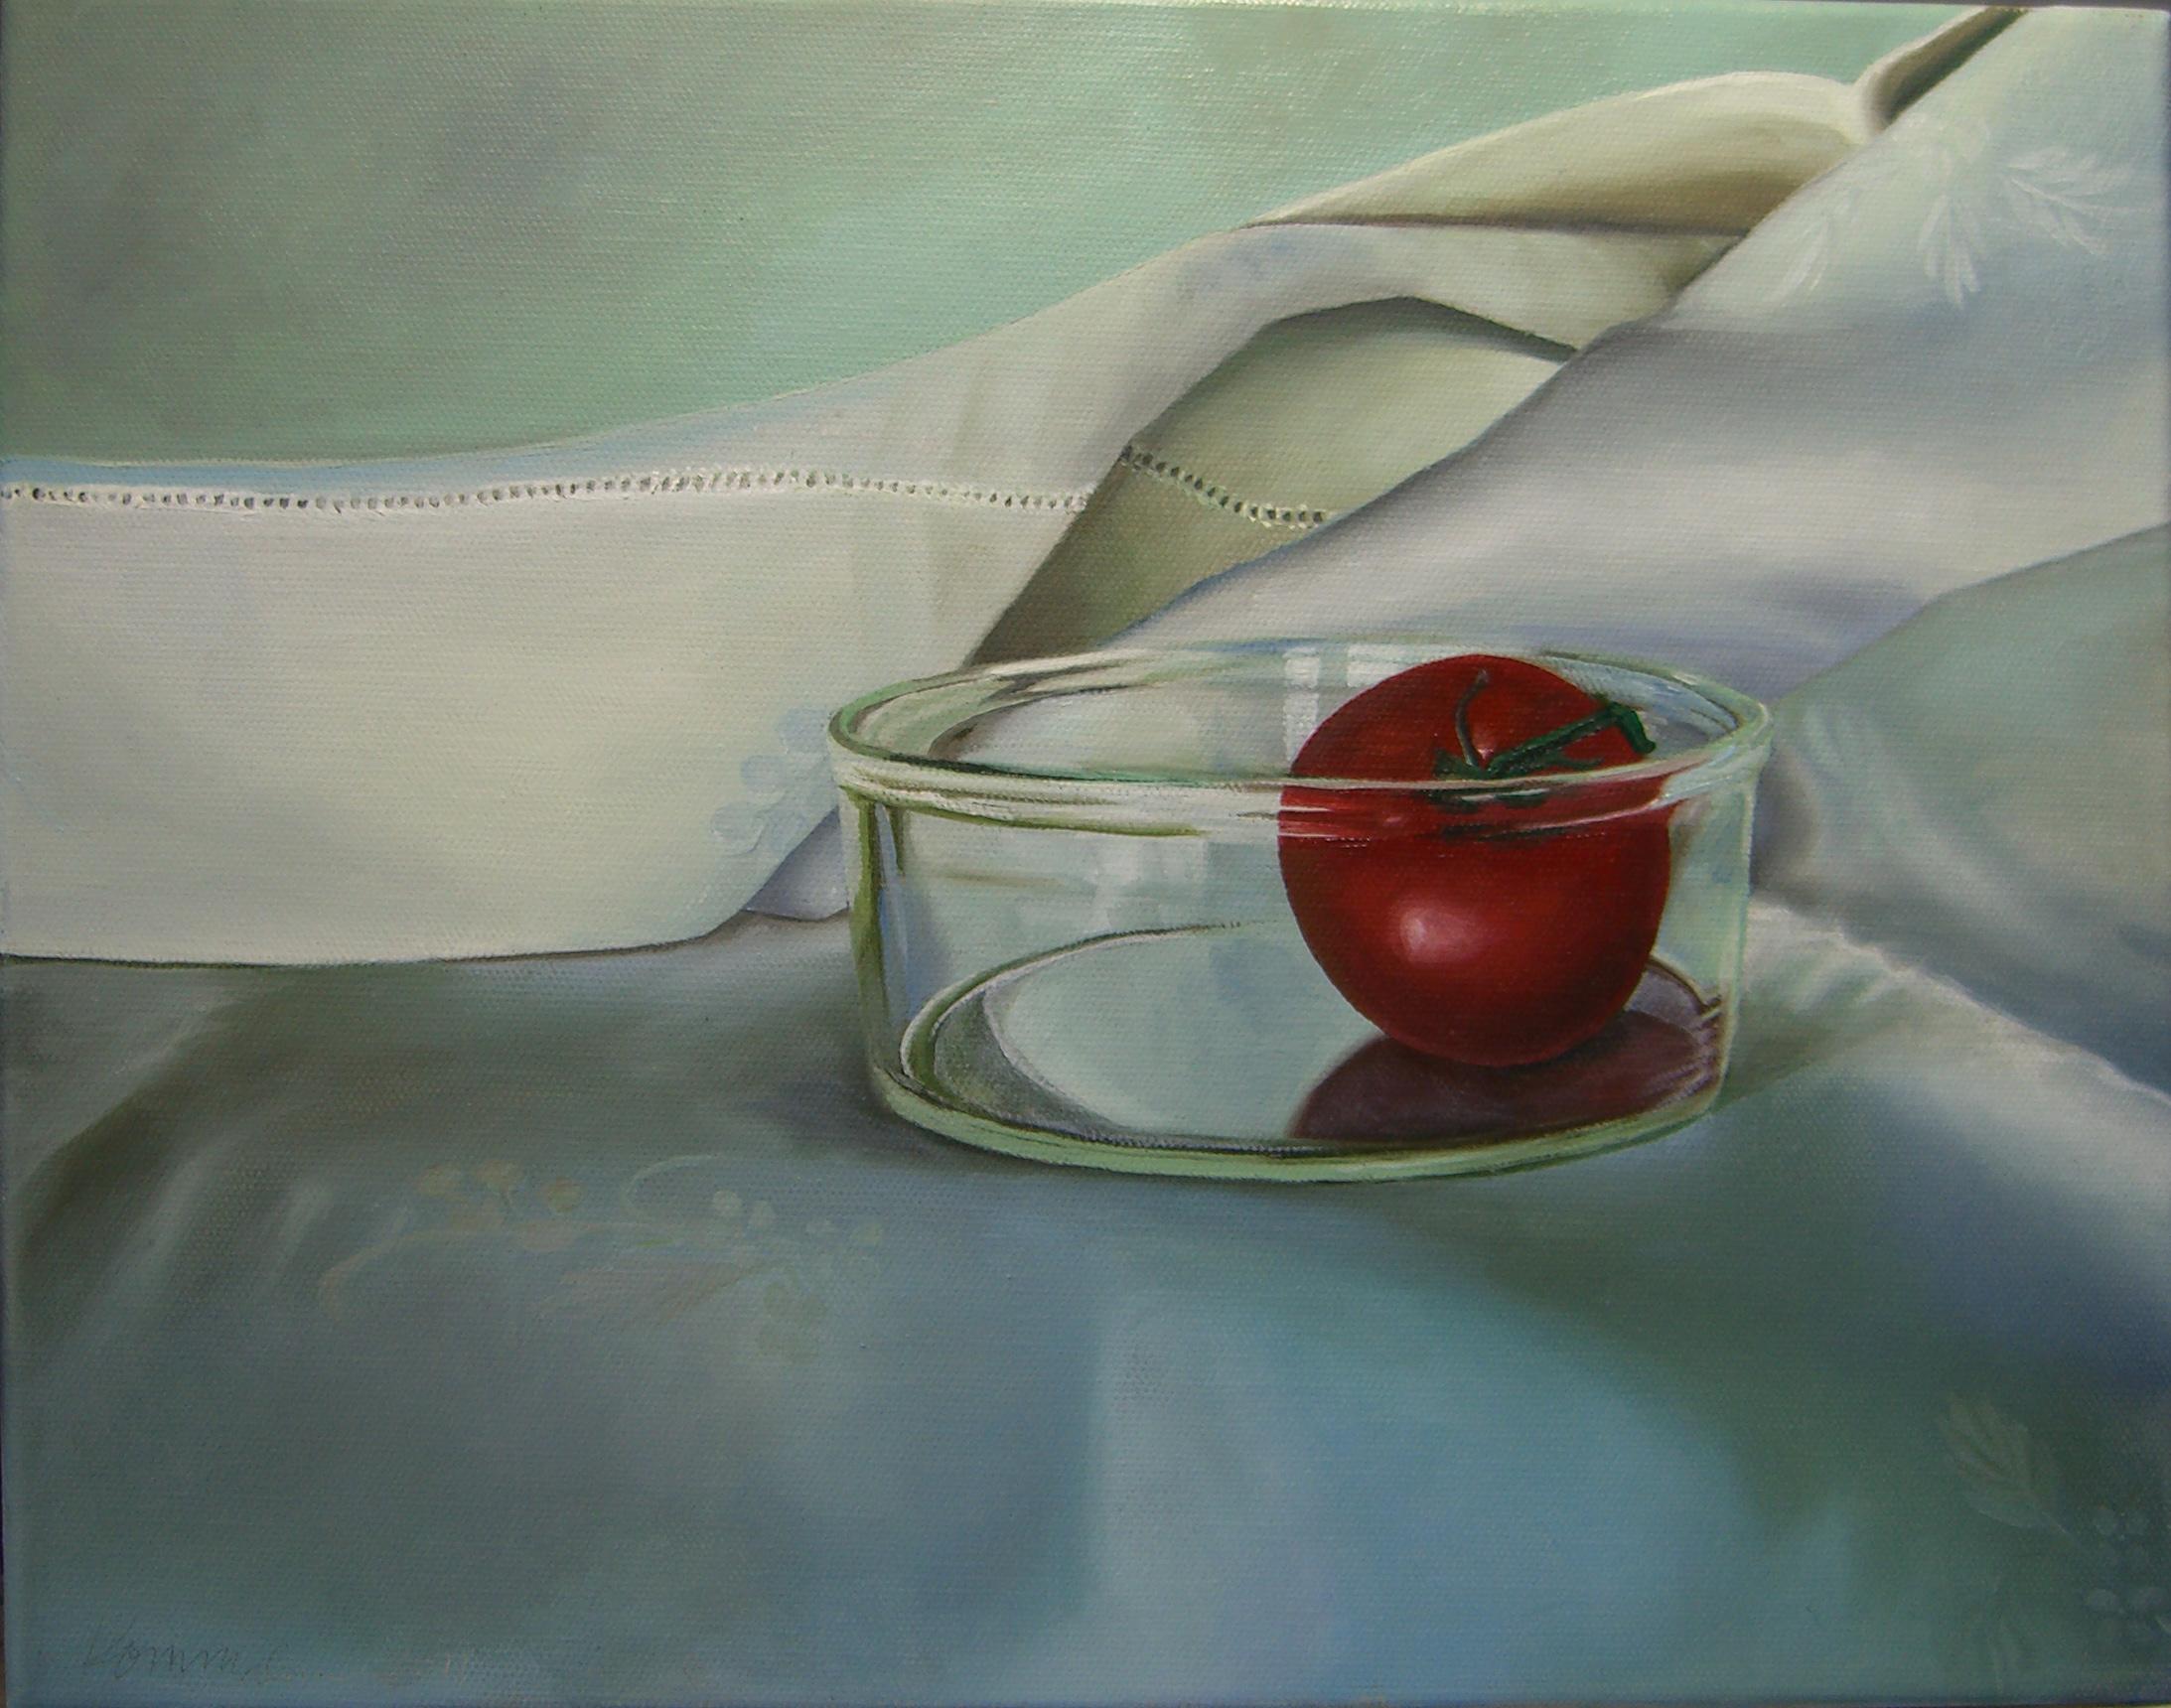 White Cloth with Tomato